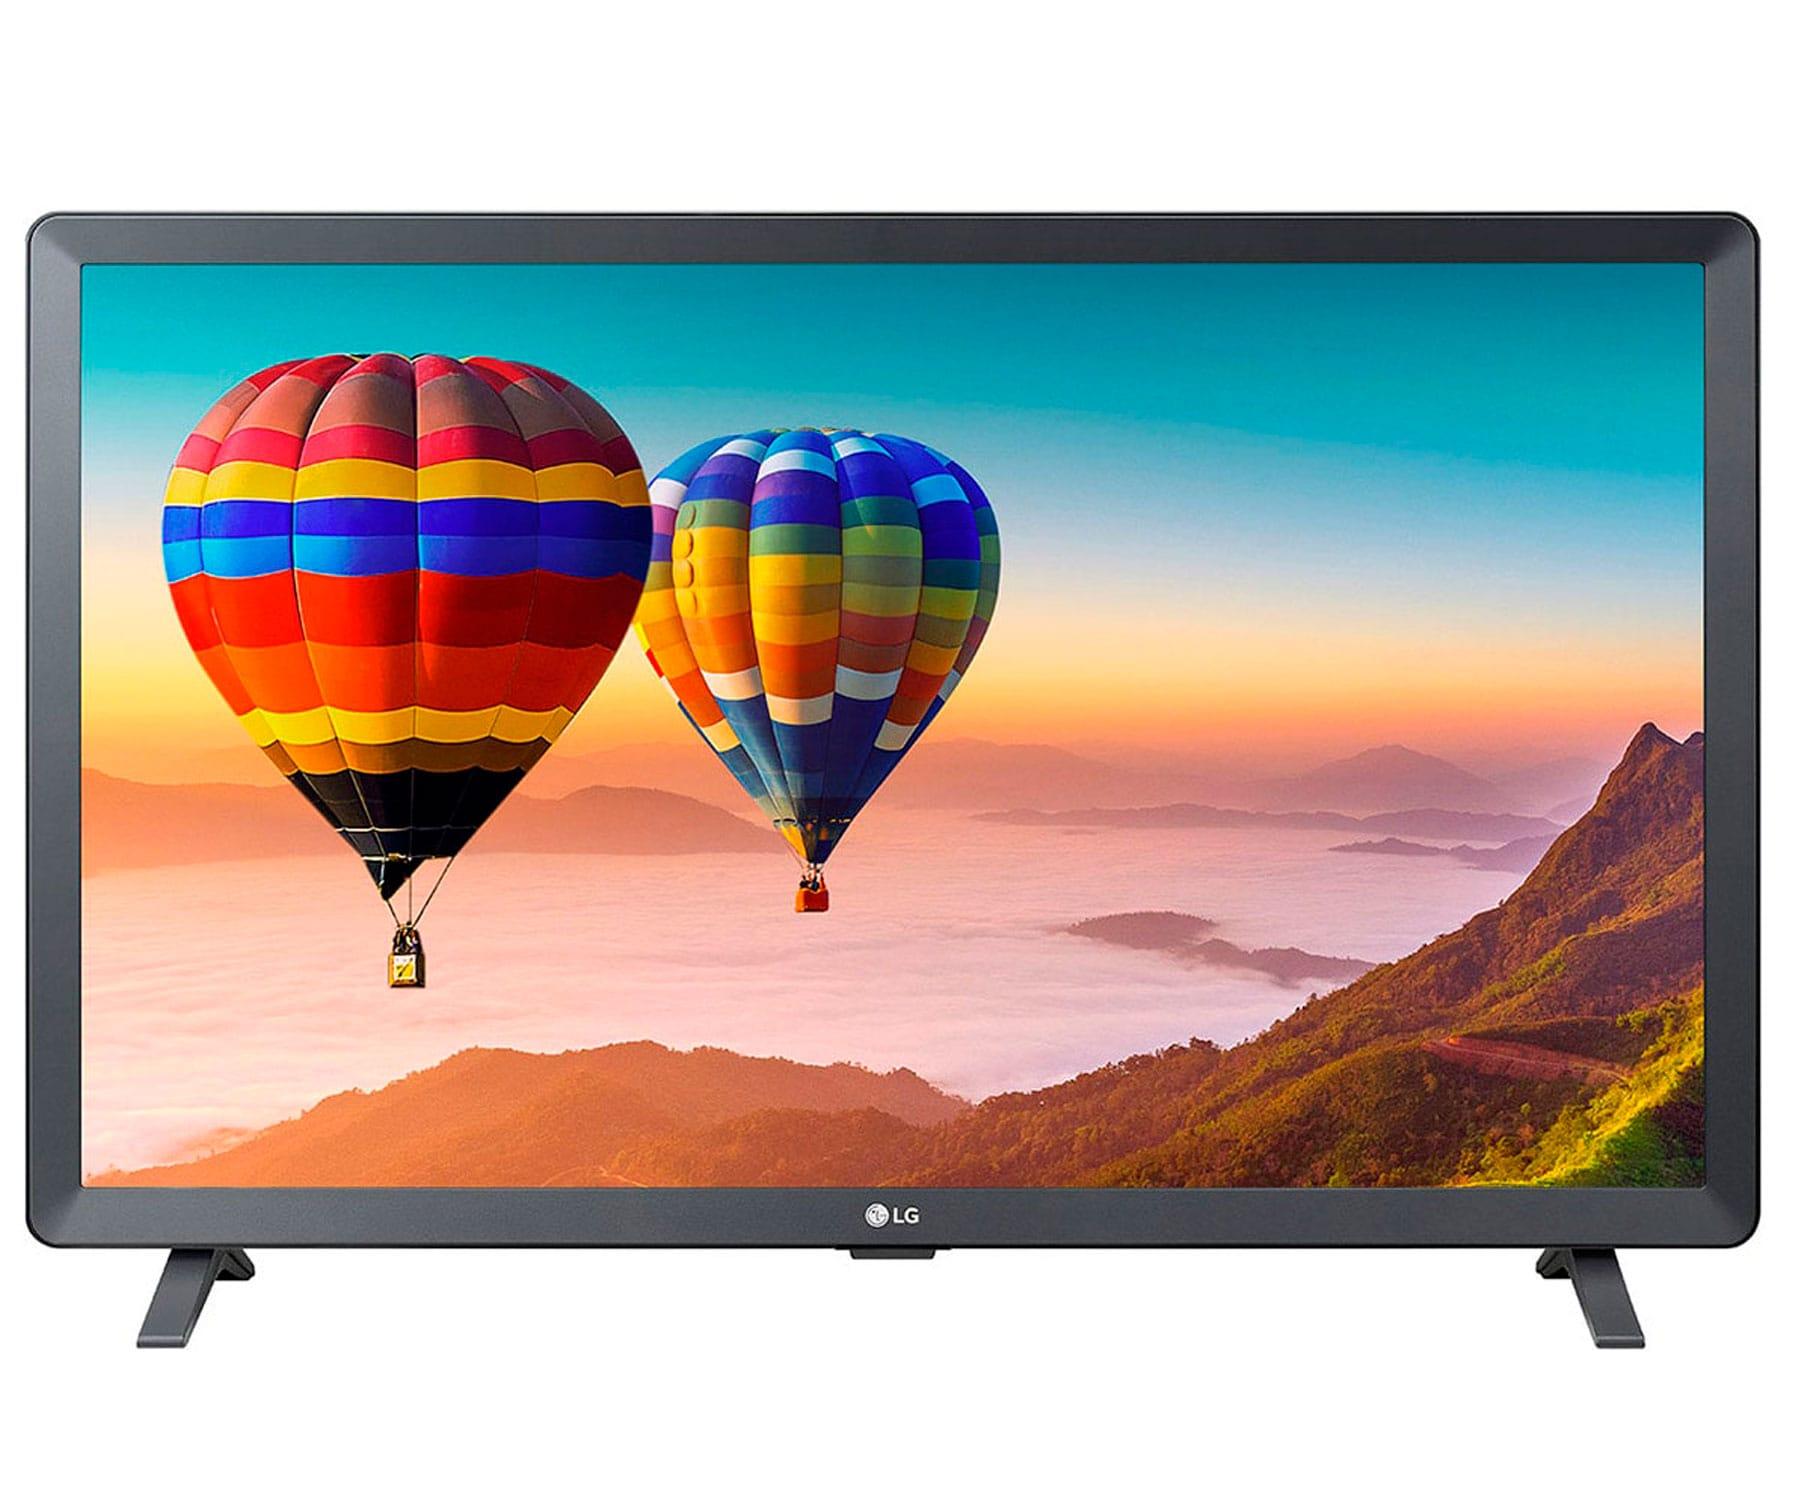 LG 28TN525S-PZ NEGRO TELEVISOR MONITOR 28'' LCD LED HD READY SMART TV